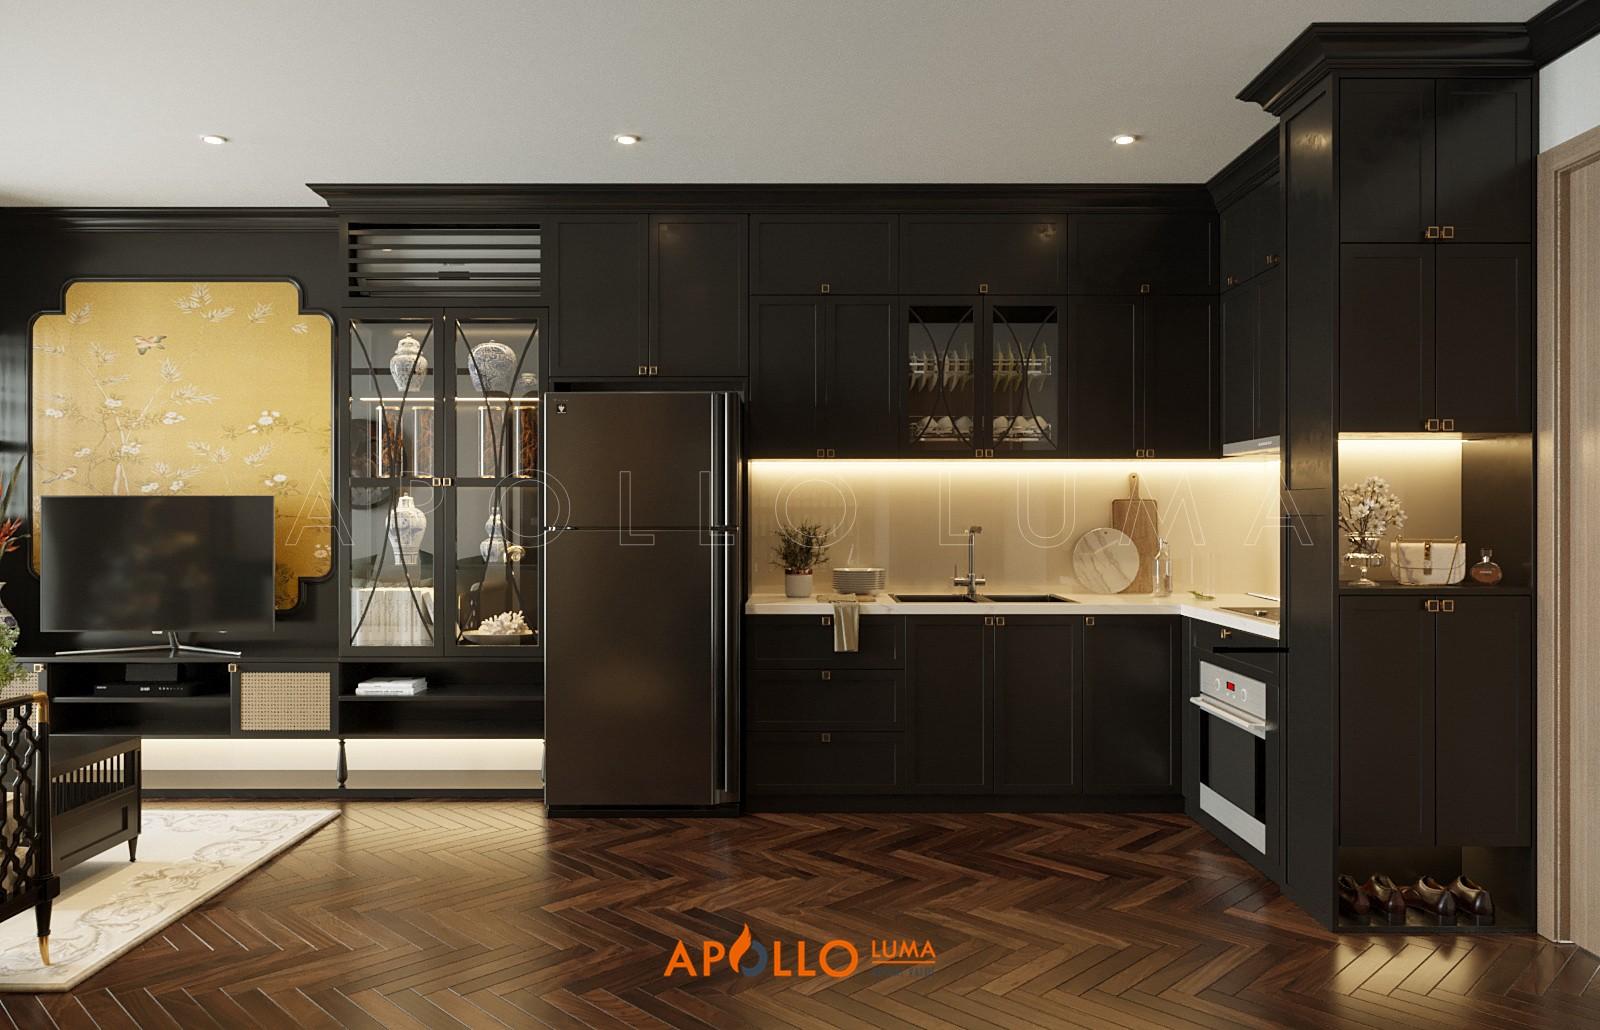 mẫu thiết kế nội thất căn 2PN+1 (43m2) Vinhomes Ocean Park & Vinhomes Smart City